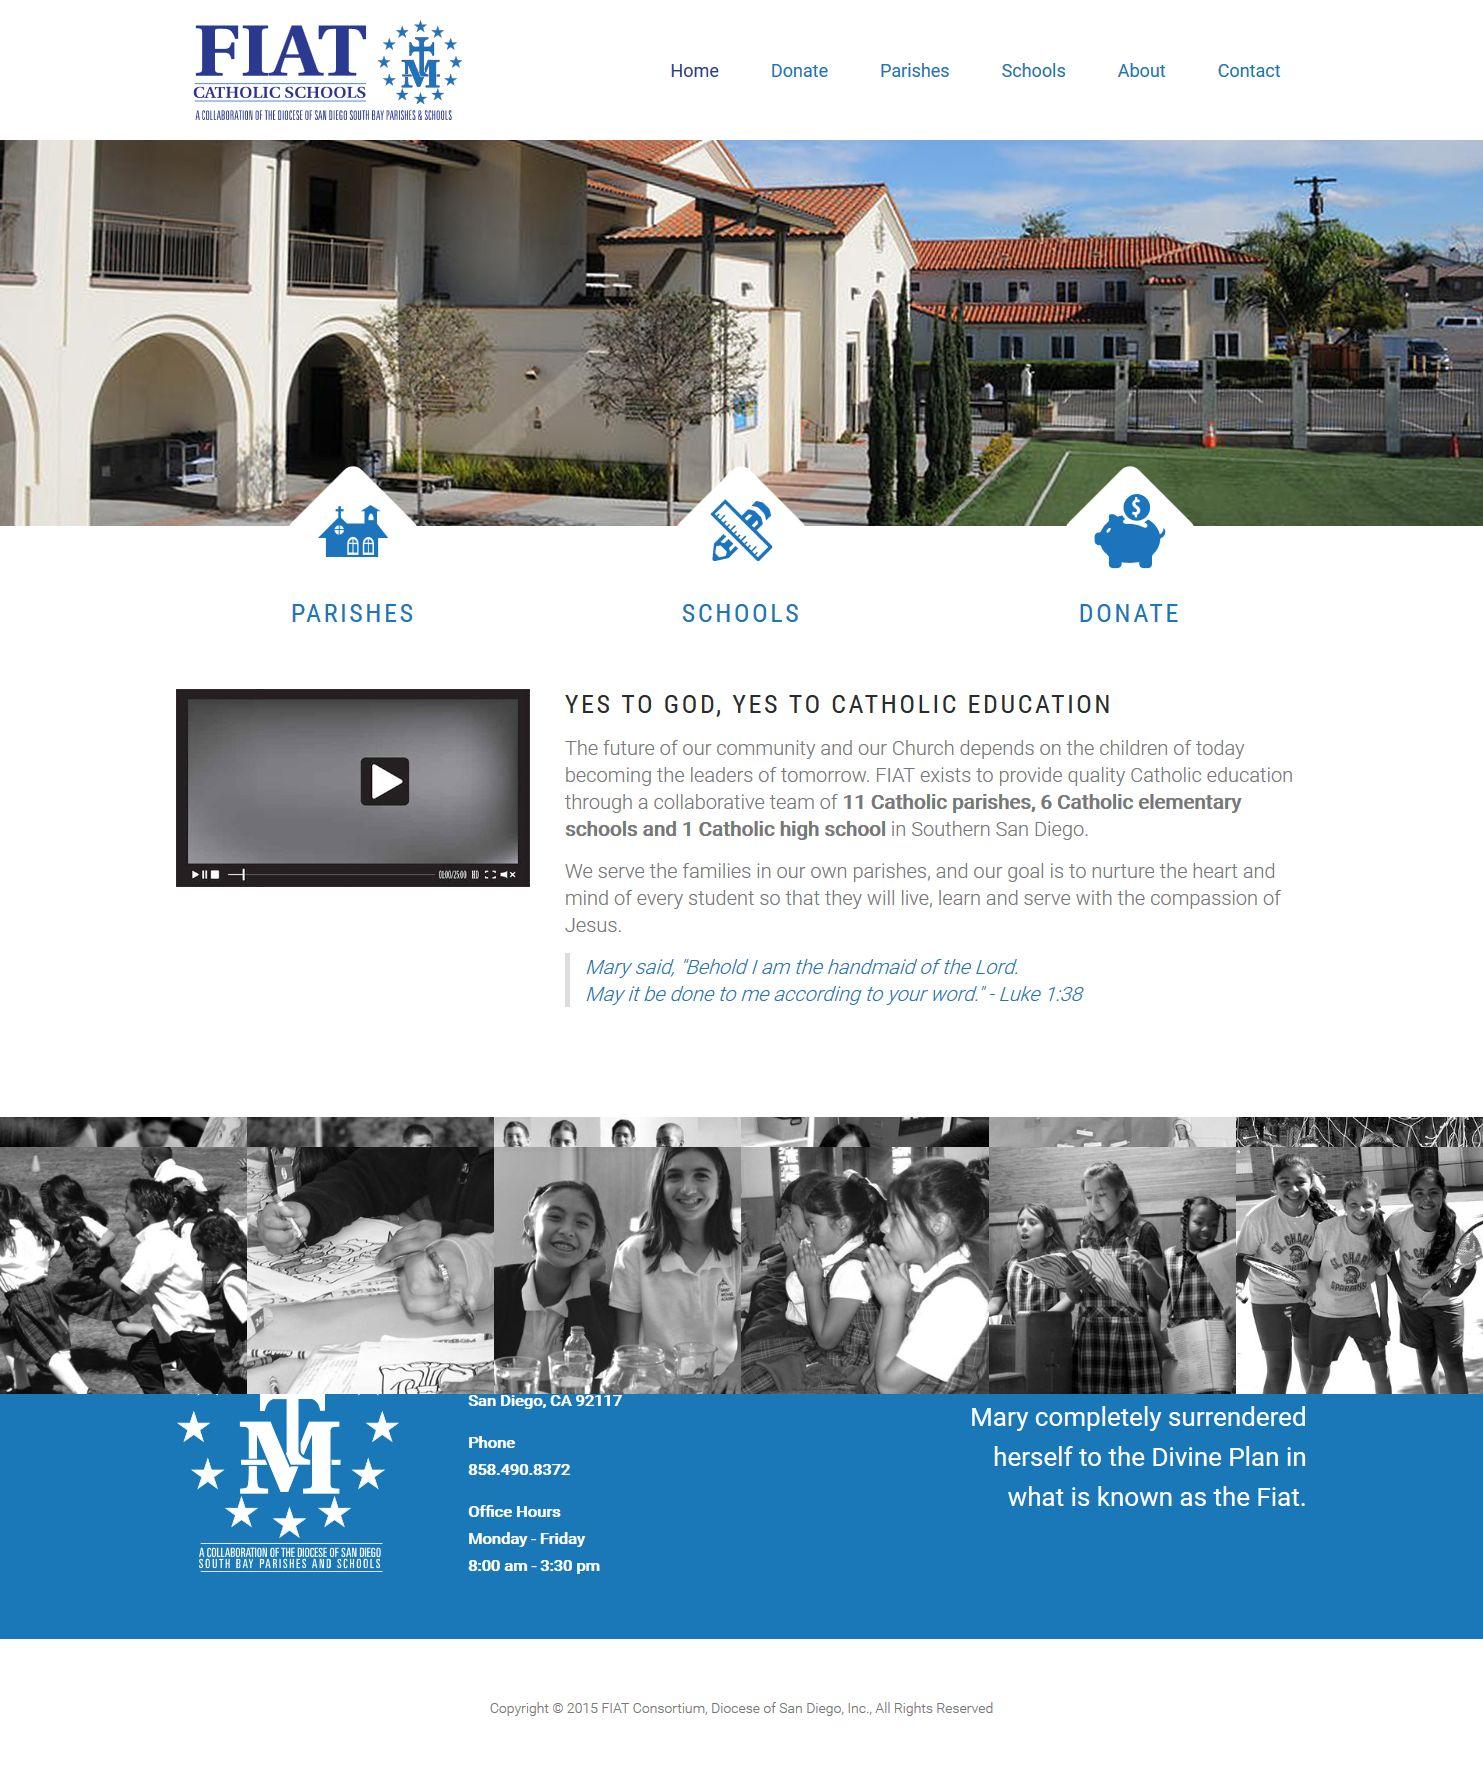 -fiat-catholic-schools-homepage